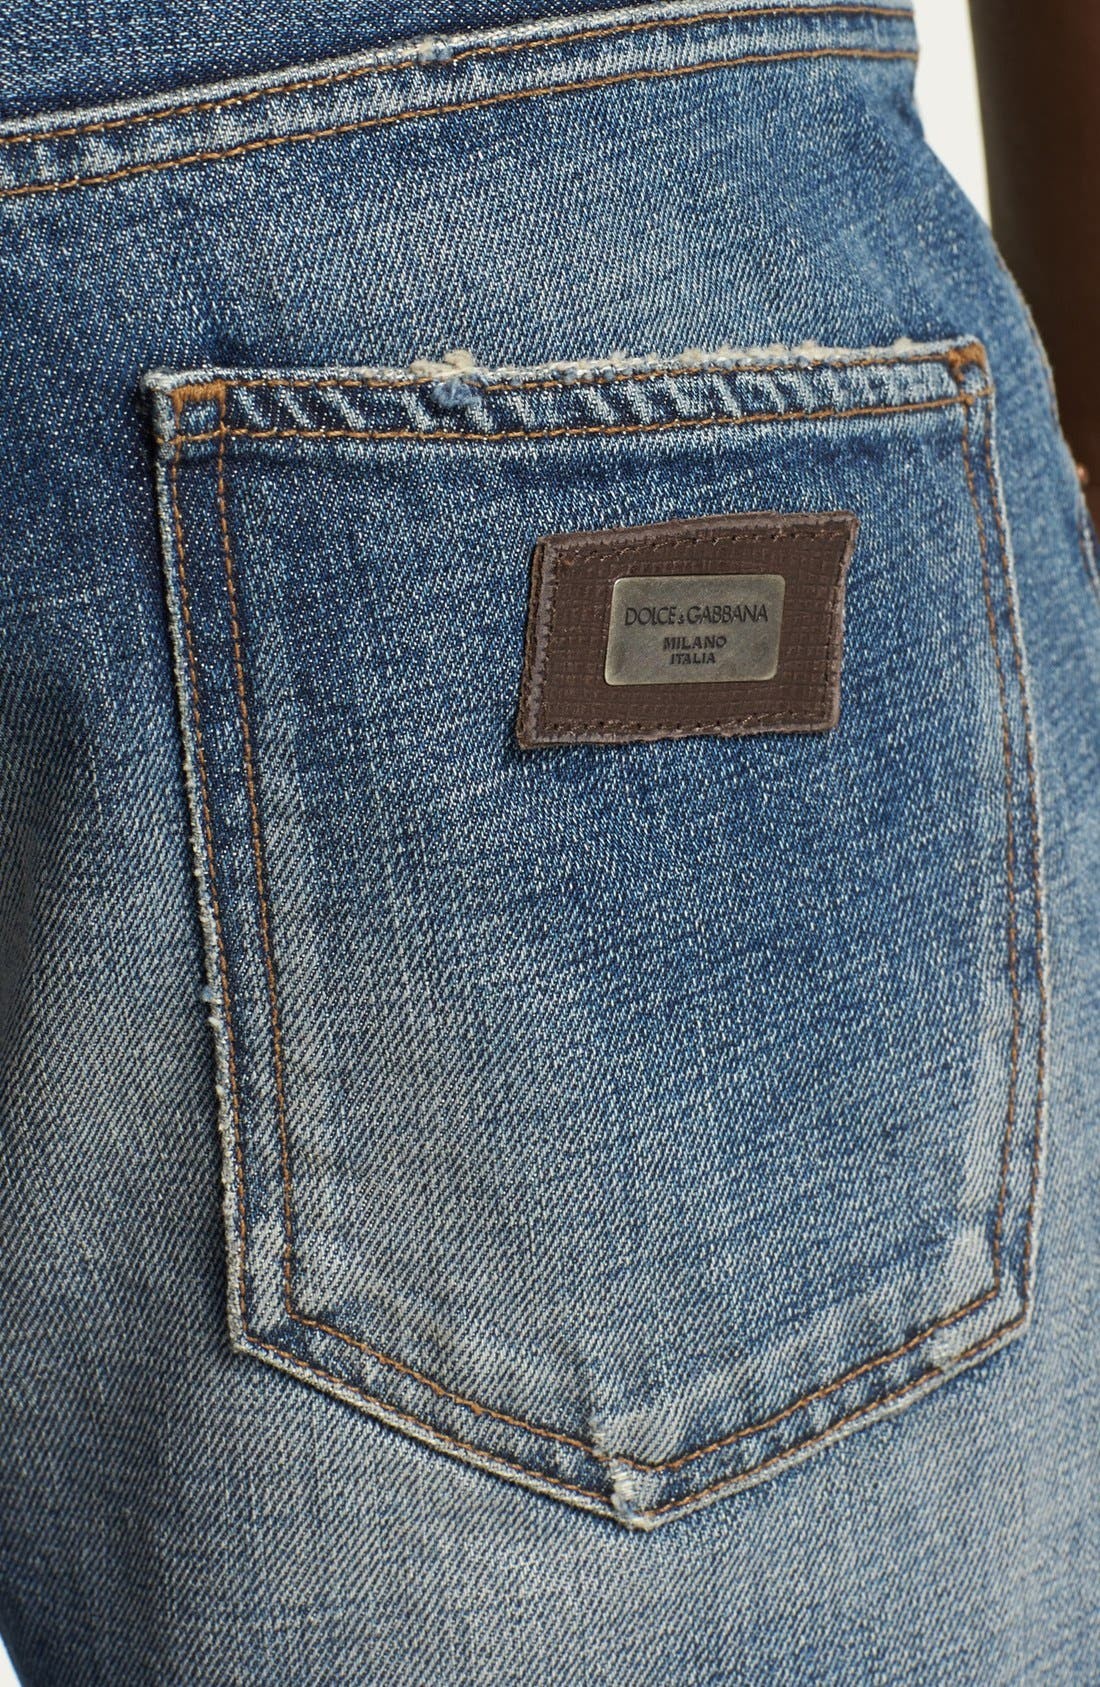 Alternate Image 4  - Dolce&Gabbana Slim Fit Jeans (Light Blue)